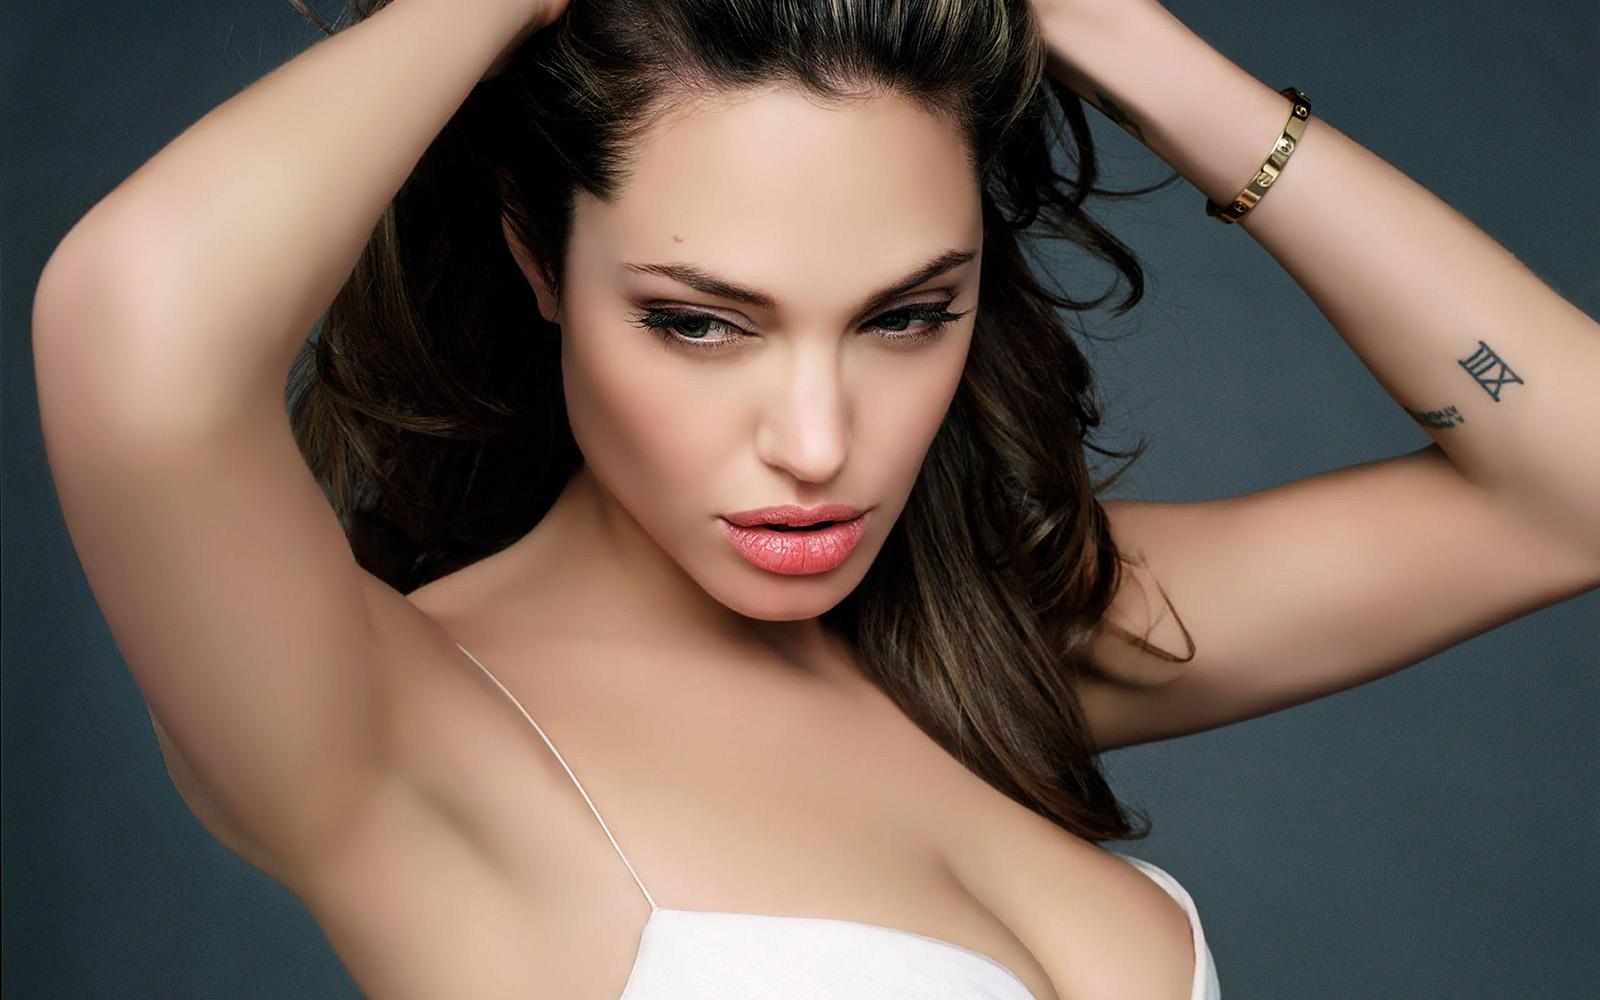 Angelina Jolie Hot Stills angelina jolie hot wallpapers | wallpapers box